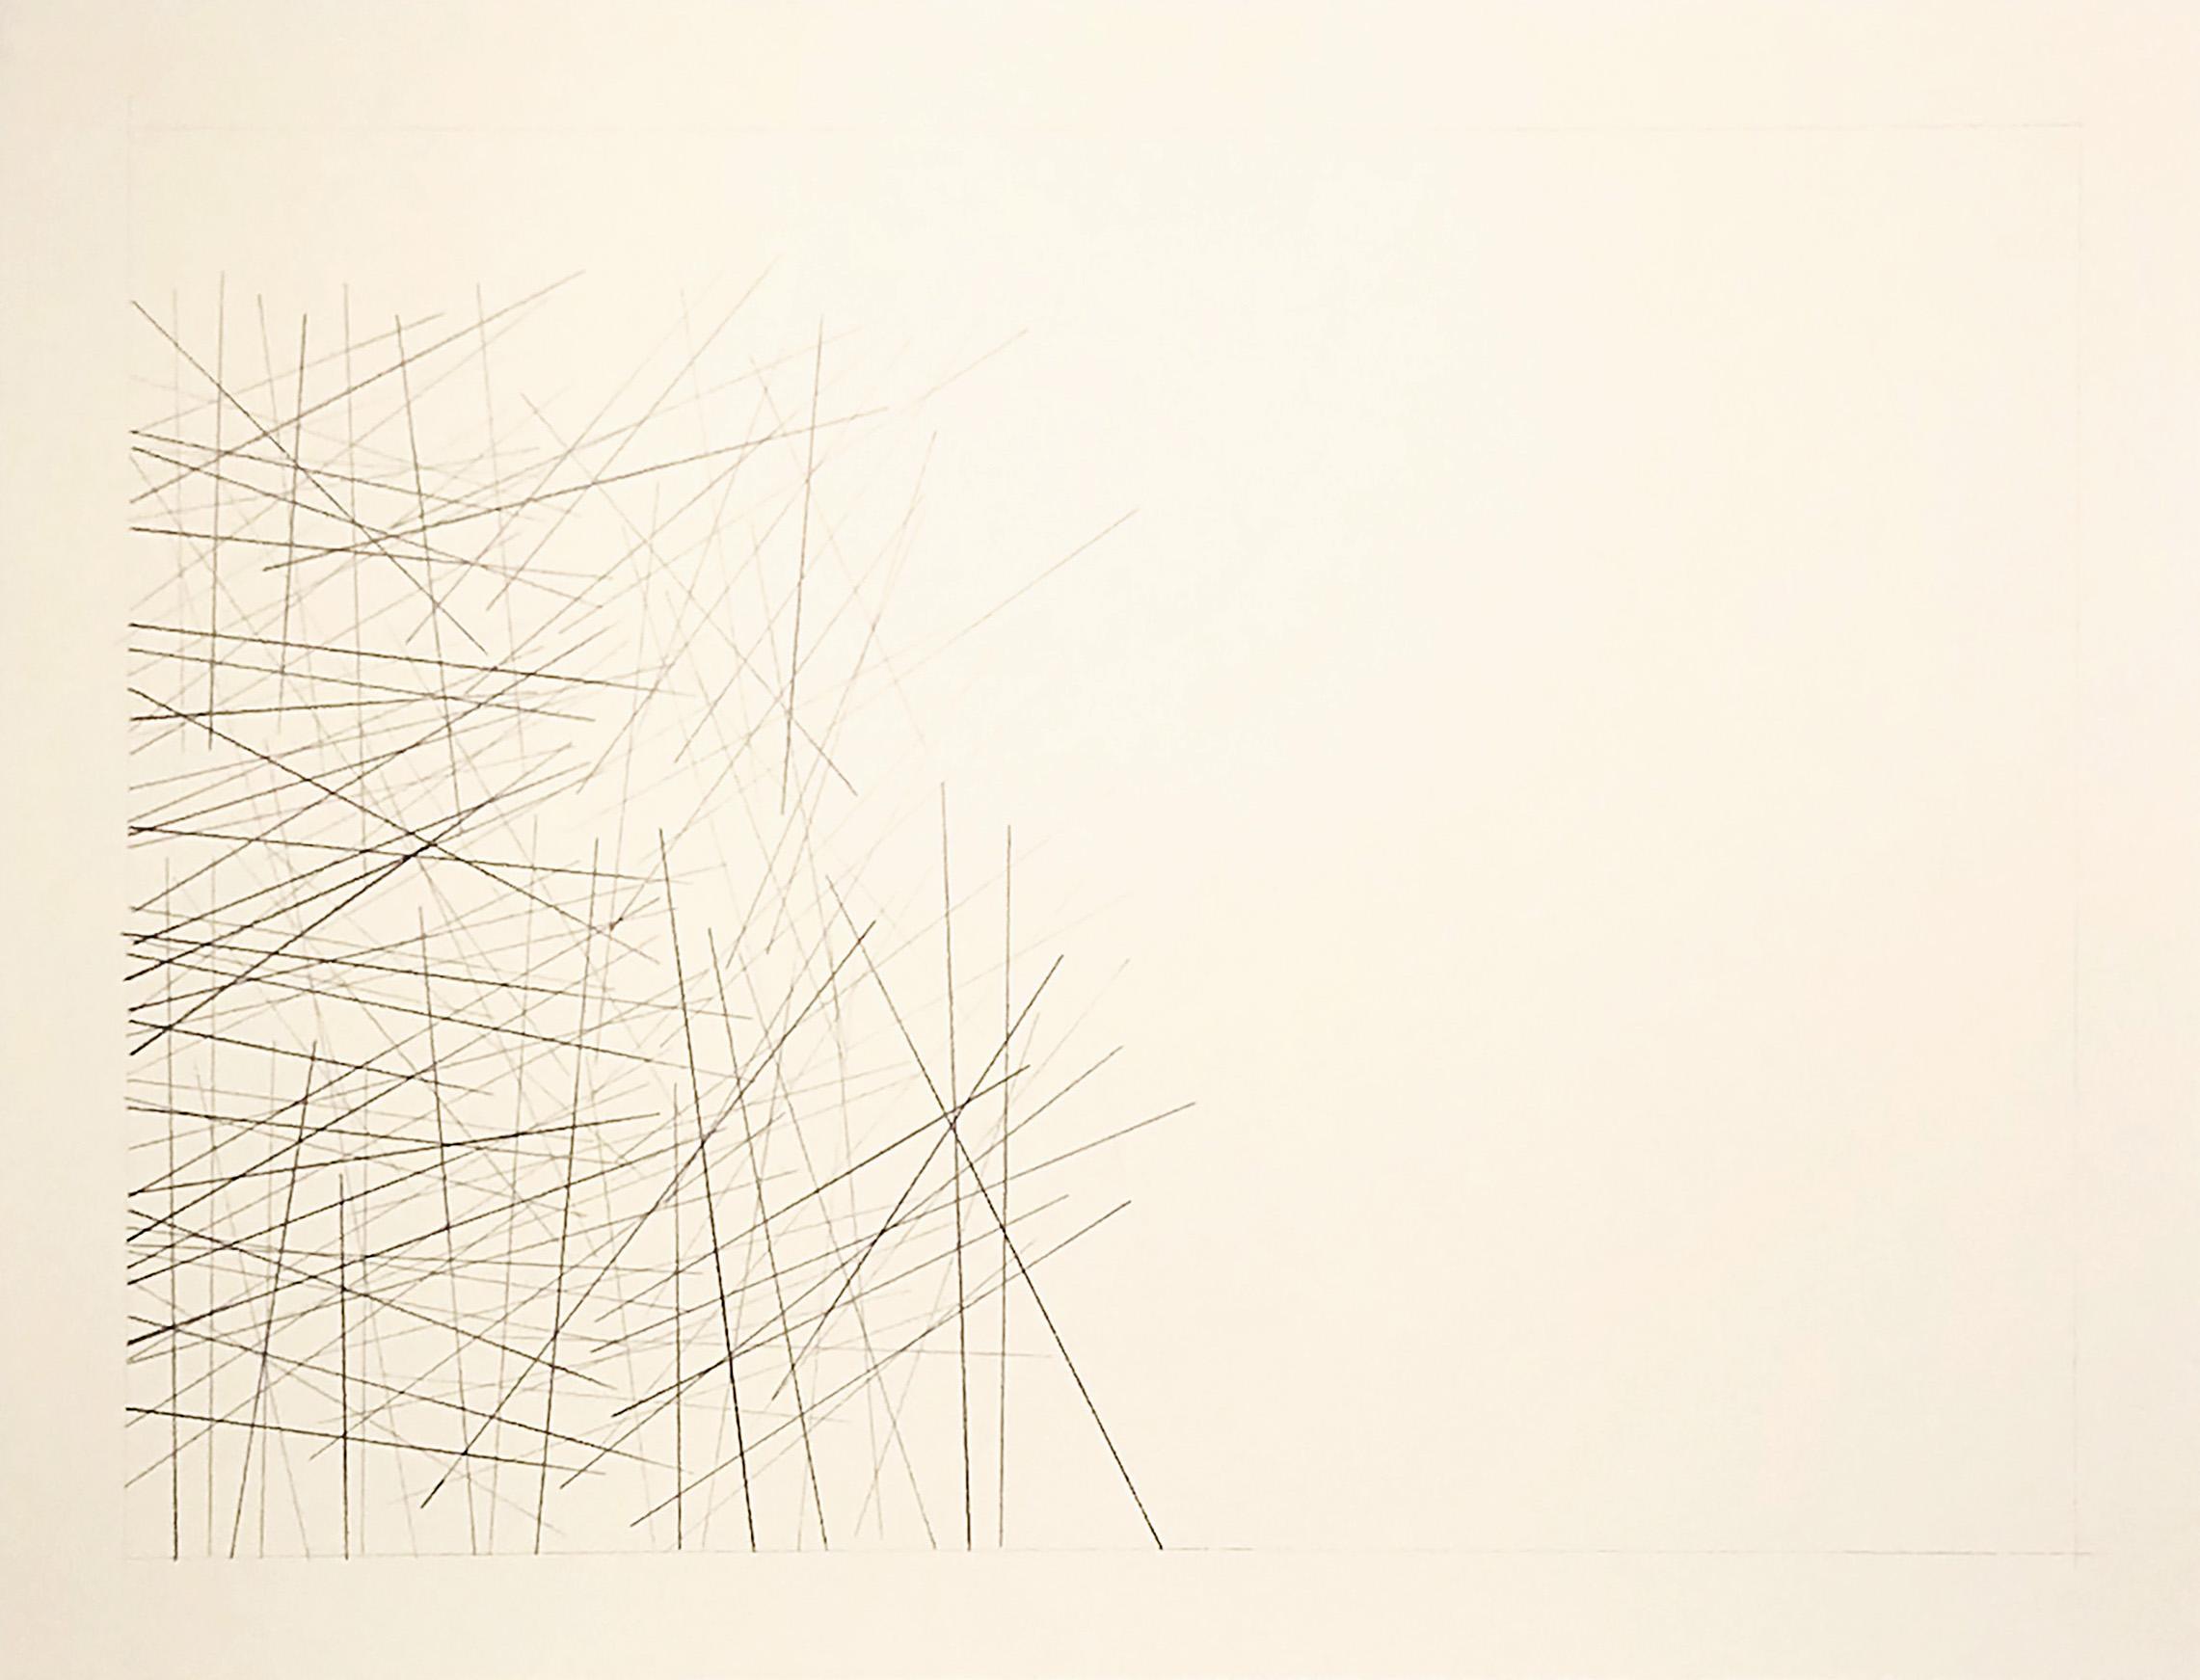 Coari, Brazil -4.0919, -63.0996,  2018  Graphite on paper  18H x 24W inches unframed  21.75H x 27.75W inches framed